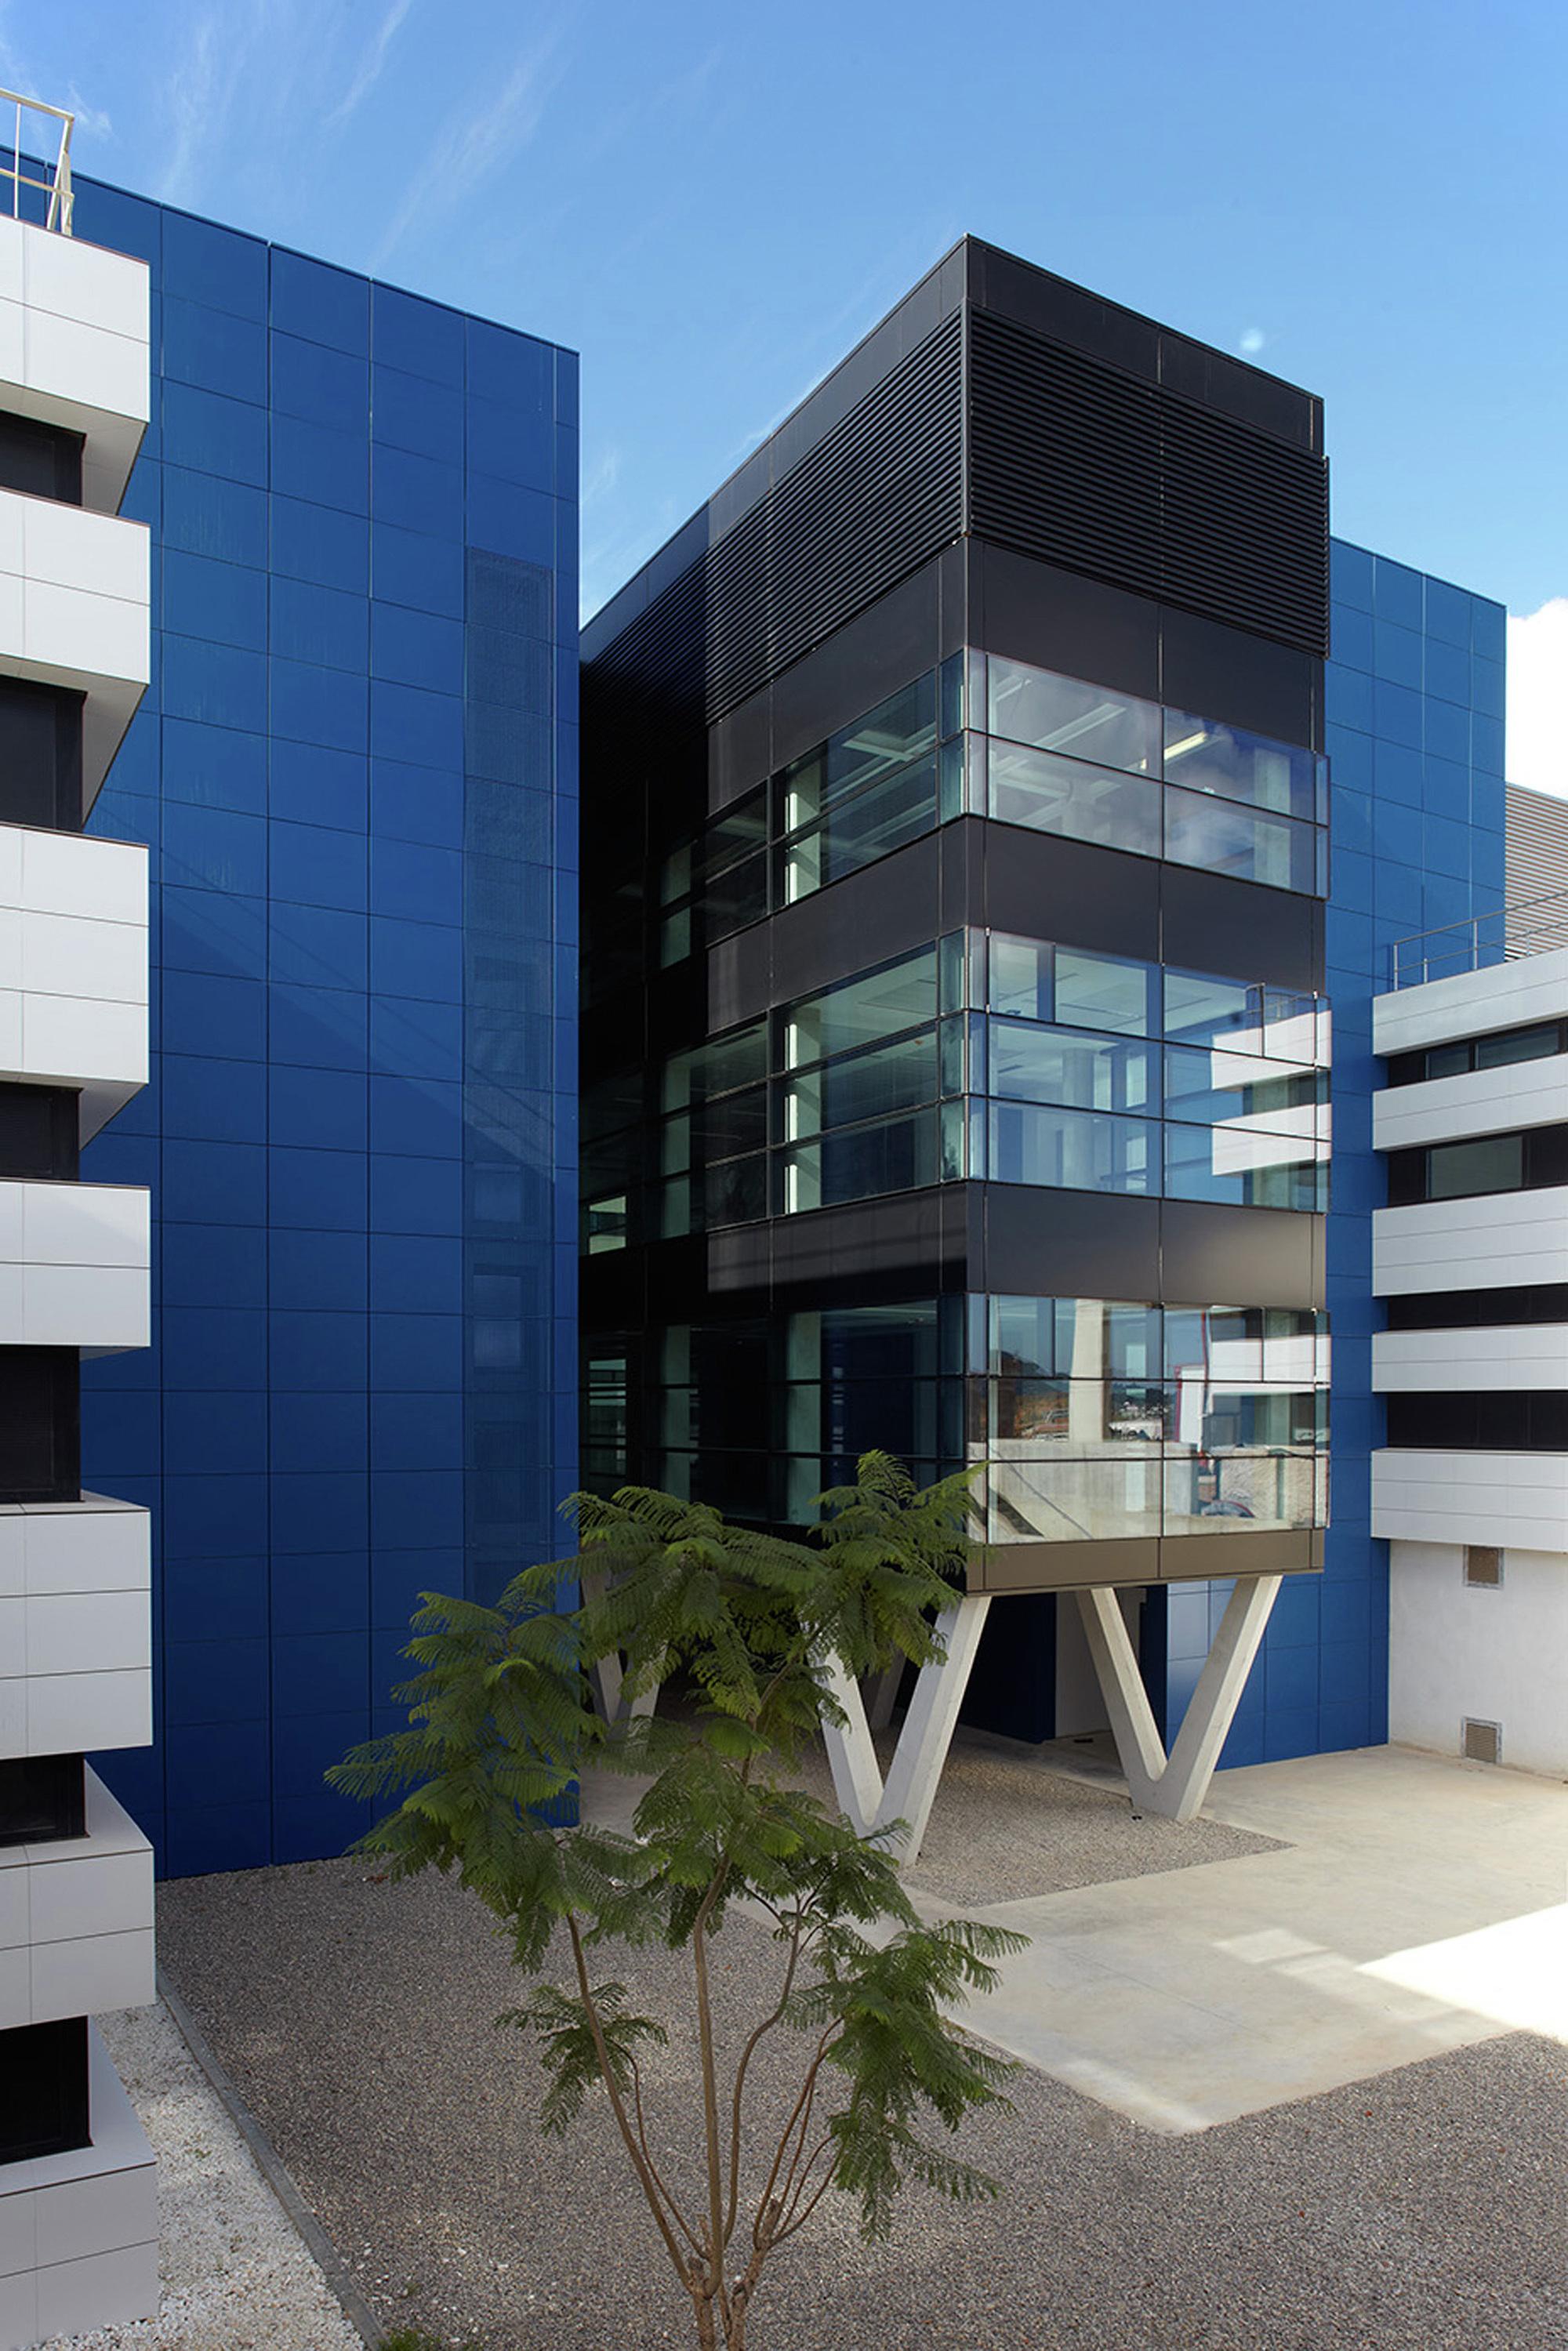 Gallery of can misses hospital luis vidal arquitectos 6 - Arquitectos ibiza ...